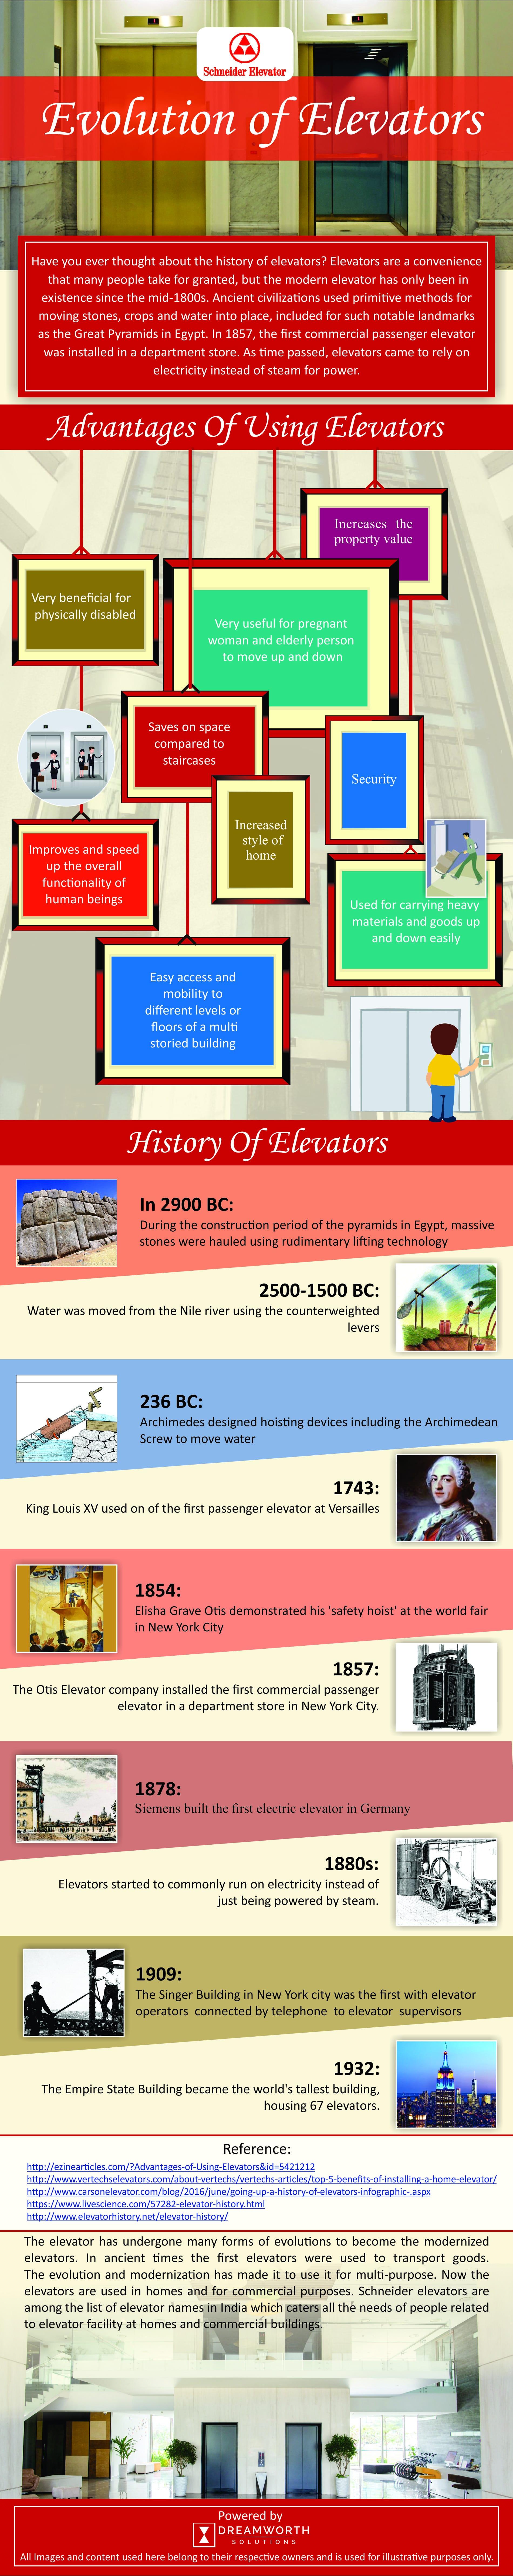 Evolution of Elevator